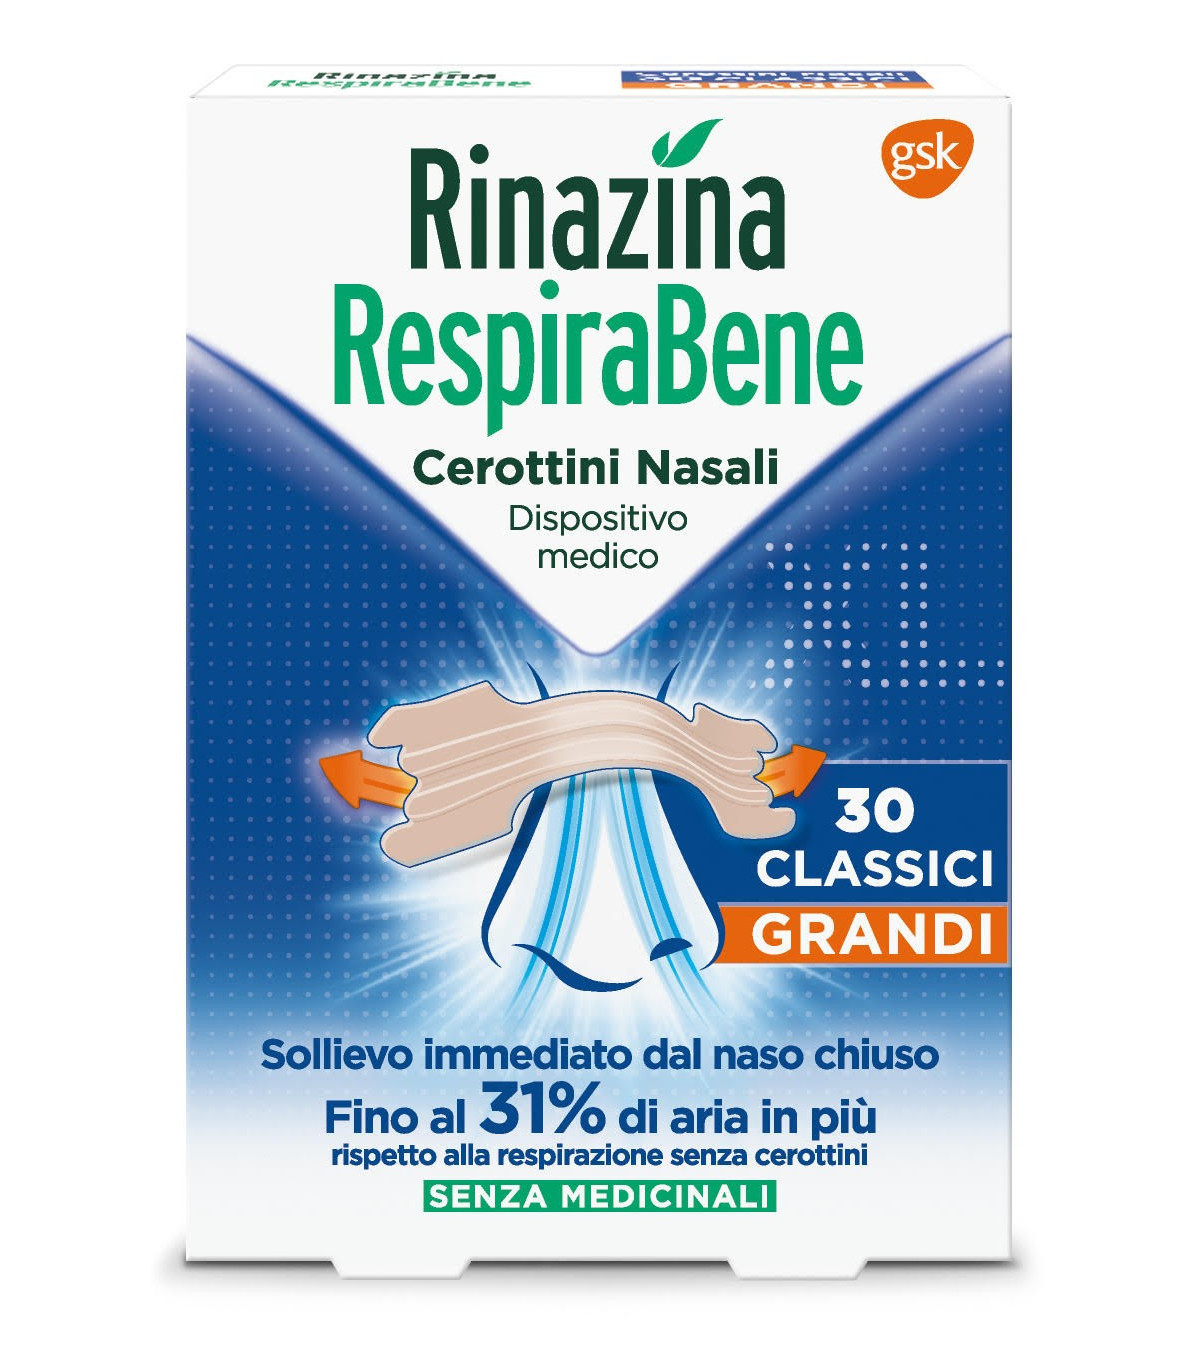 RINAZINA RESPIRABENE10 cerotti trasparenti